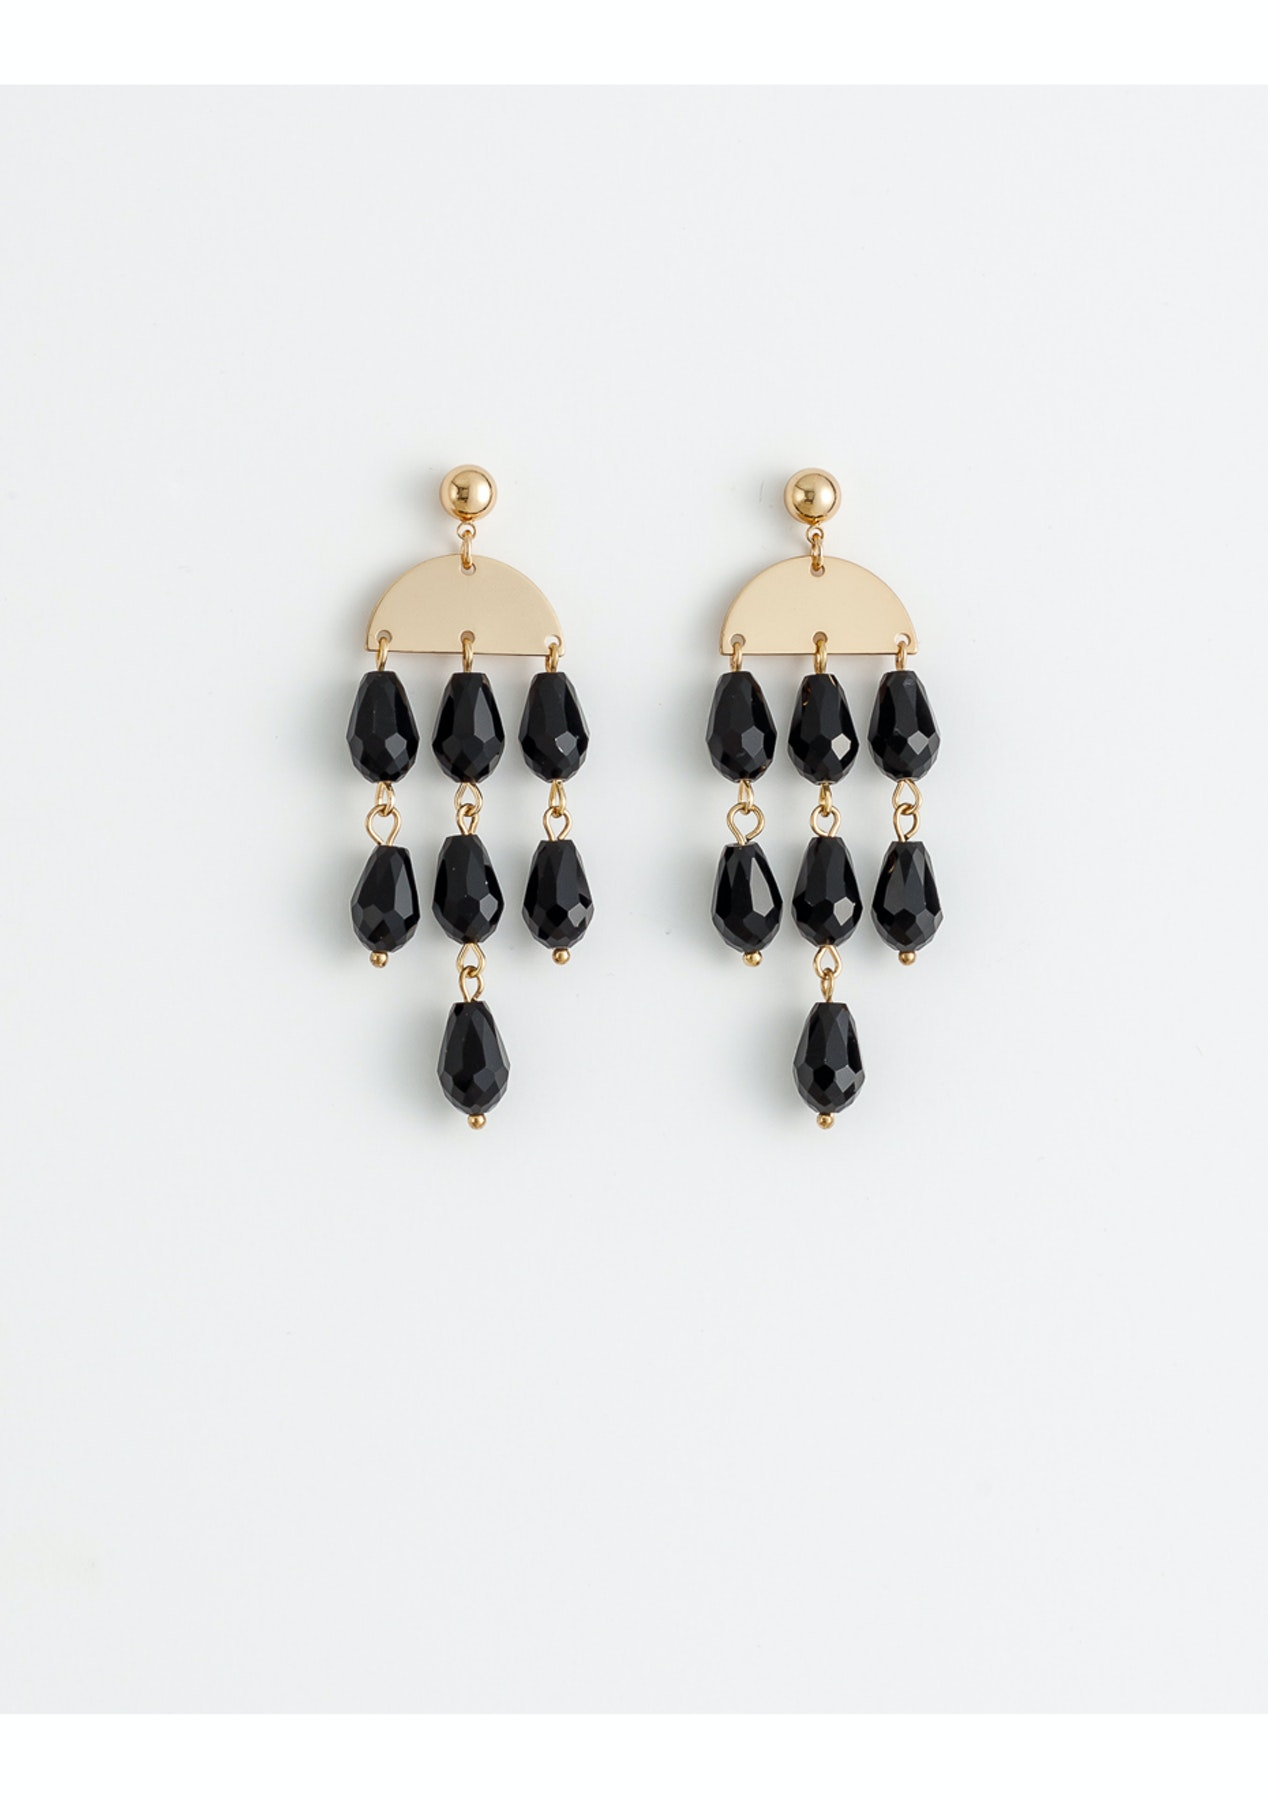 a13bd83f5dd5 Damsel by Stella + Gemma - Earrings Black Chandelier - Boxing Day Stella +  Gemma Under  20 Sale! - Onceit